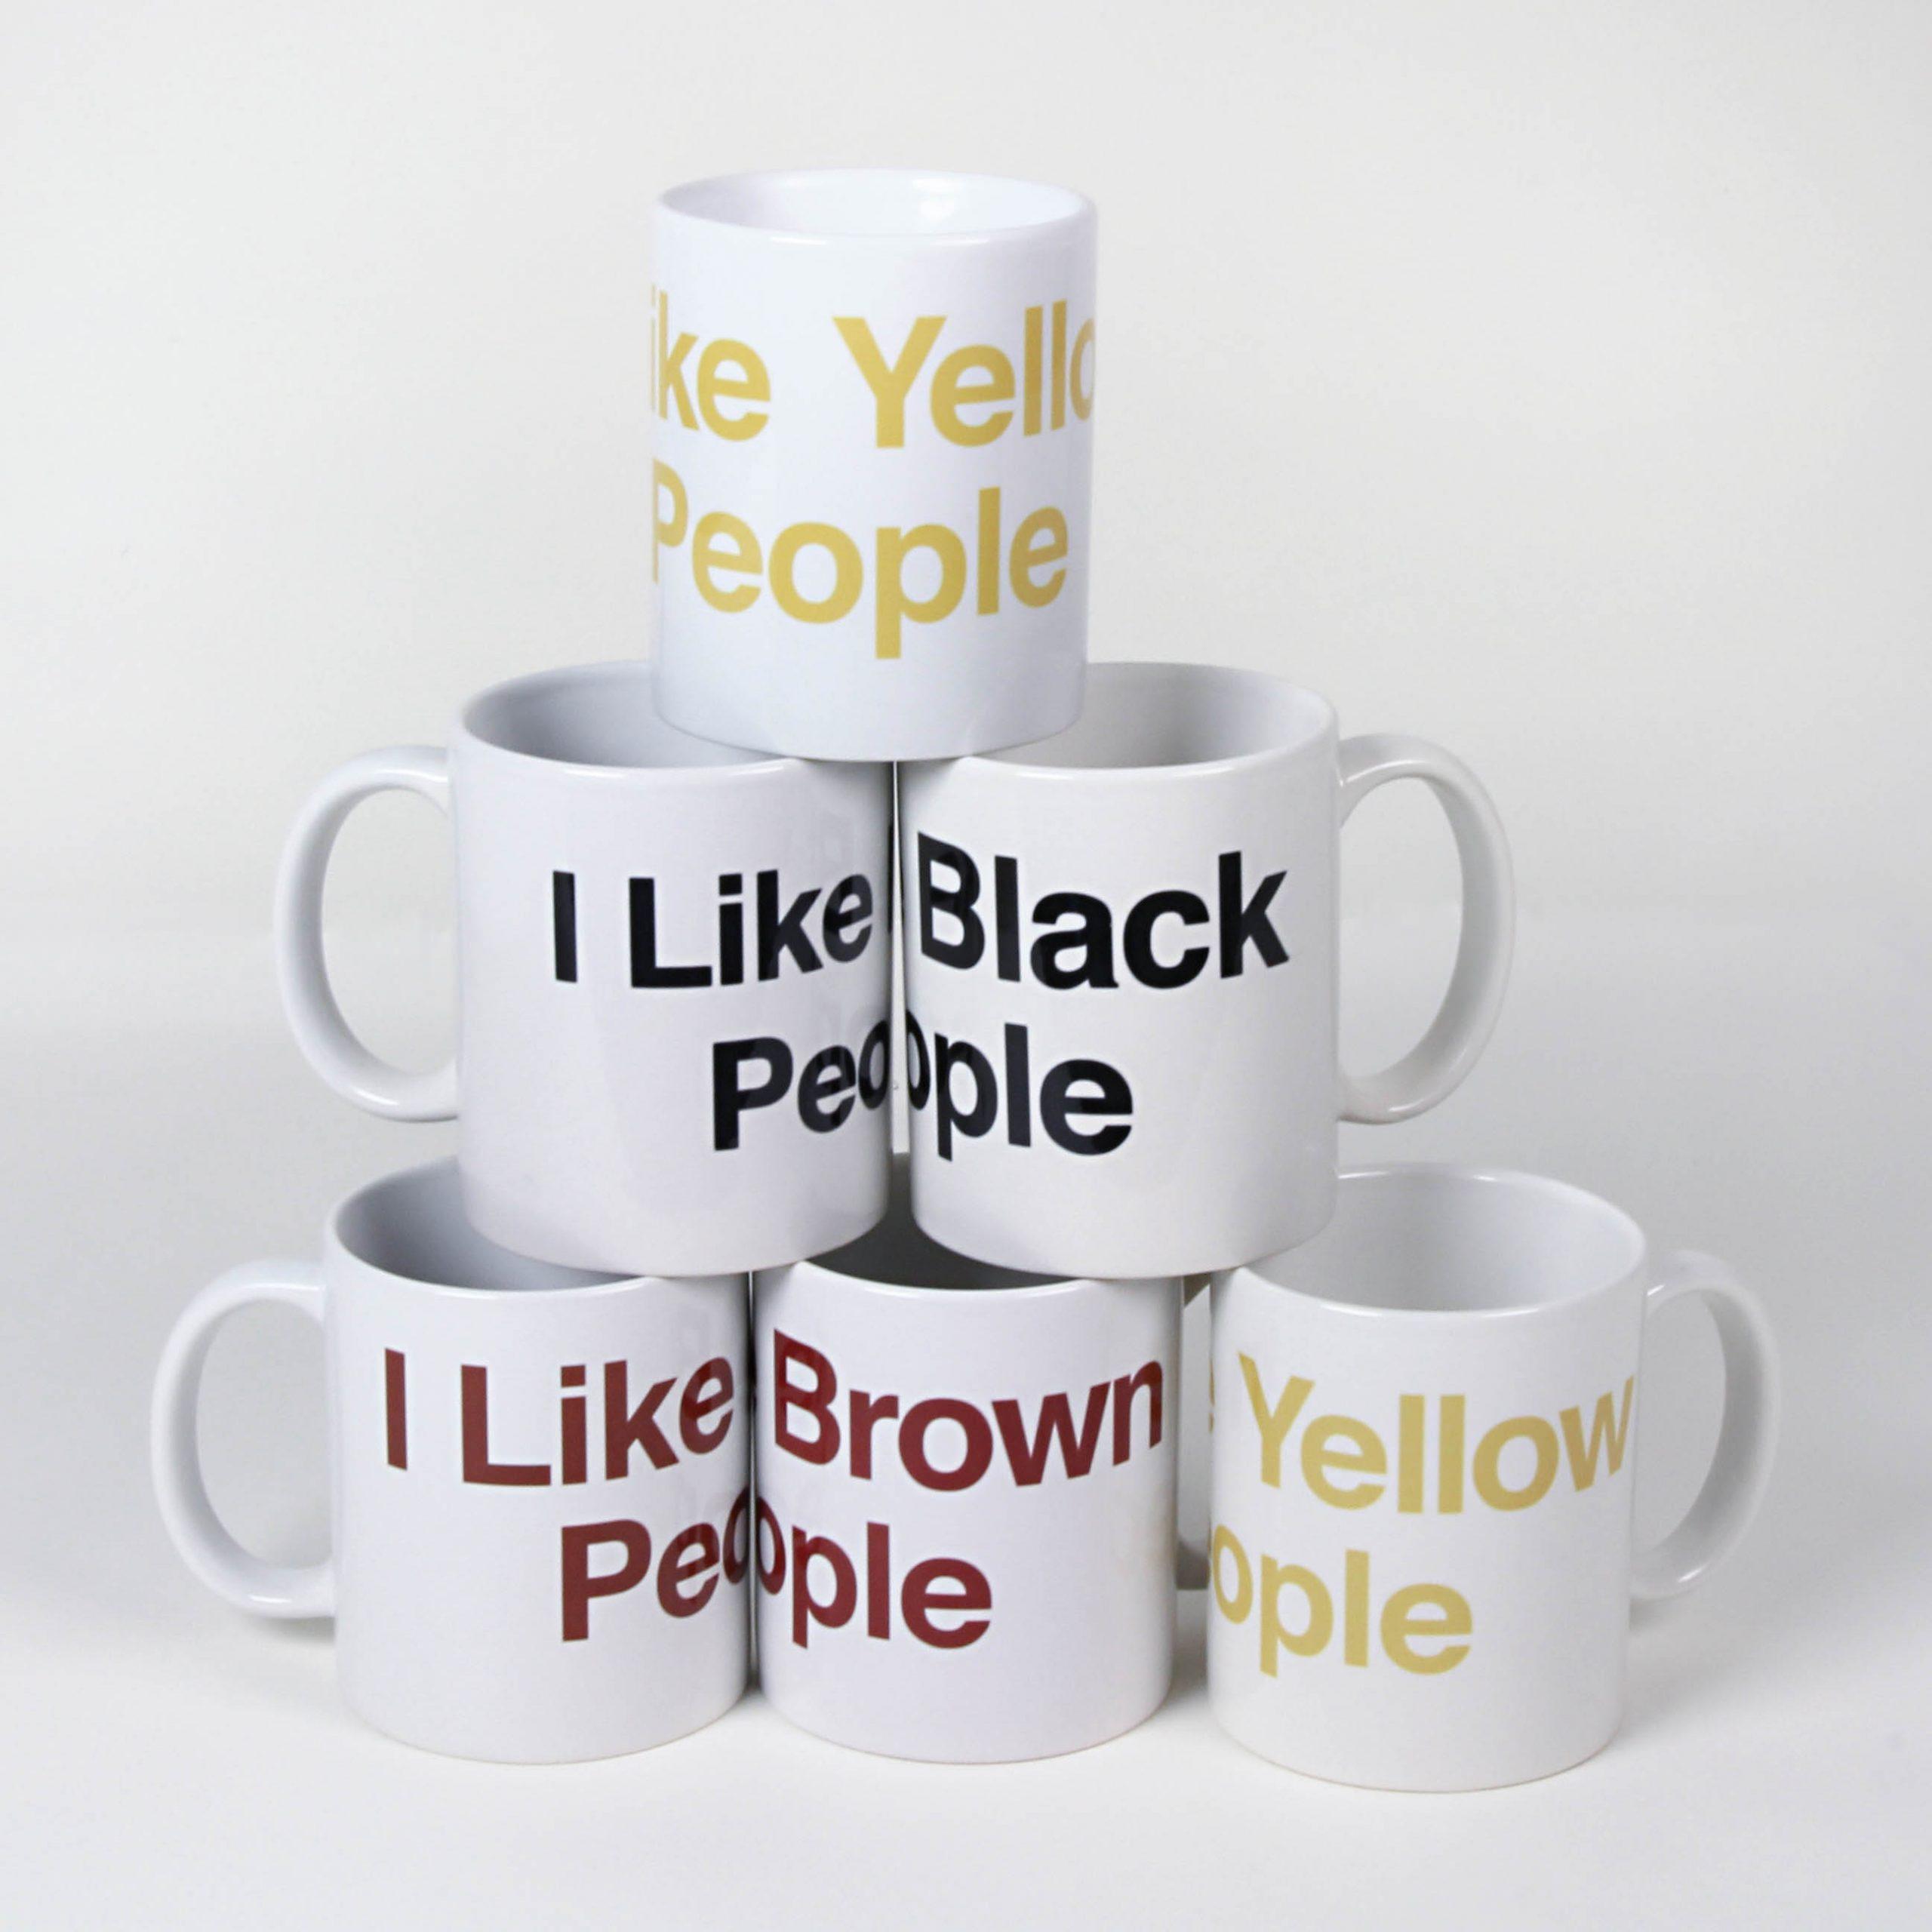 Linda Hesh, White Liberal Mugs